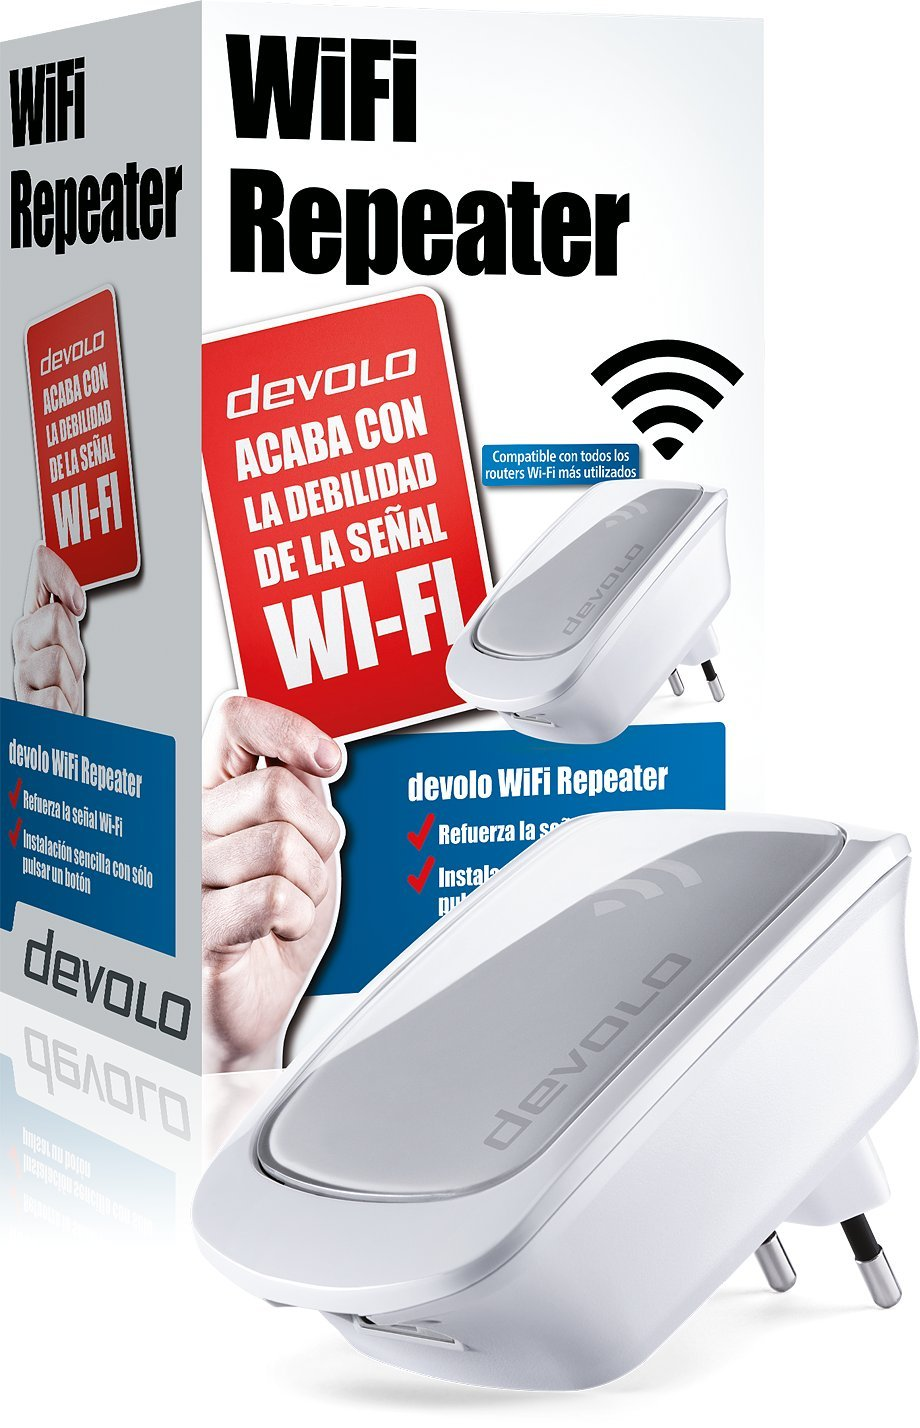 Blanco Repetidor se/ñal WiFi Devolo WiFi Repeater 300 Mbps, 1 Puerto LAN, Amplificador WiFi, WPS, WiFi Move